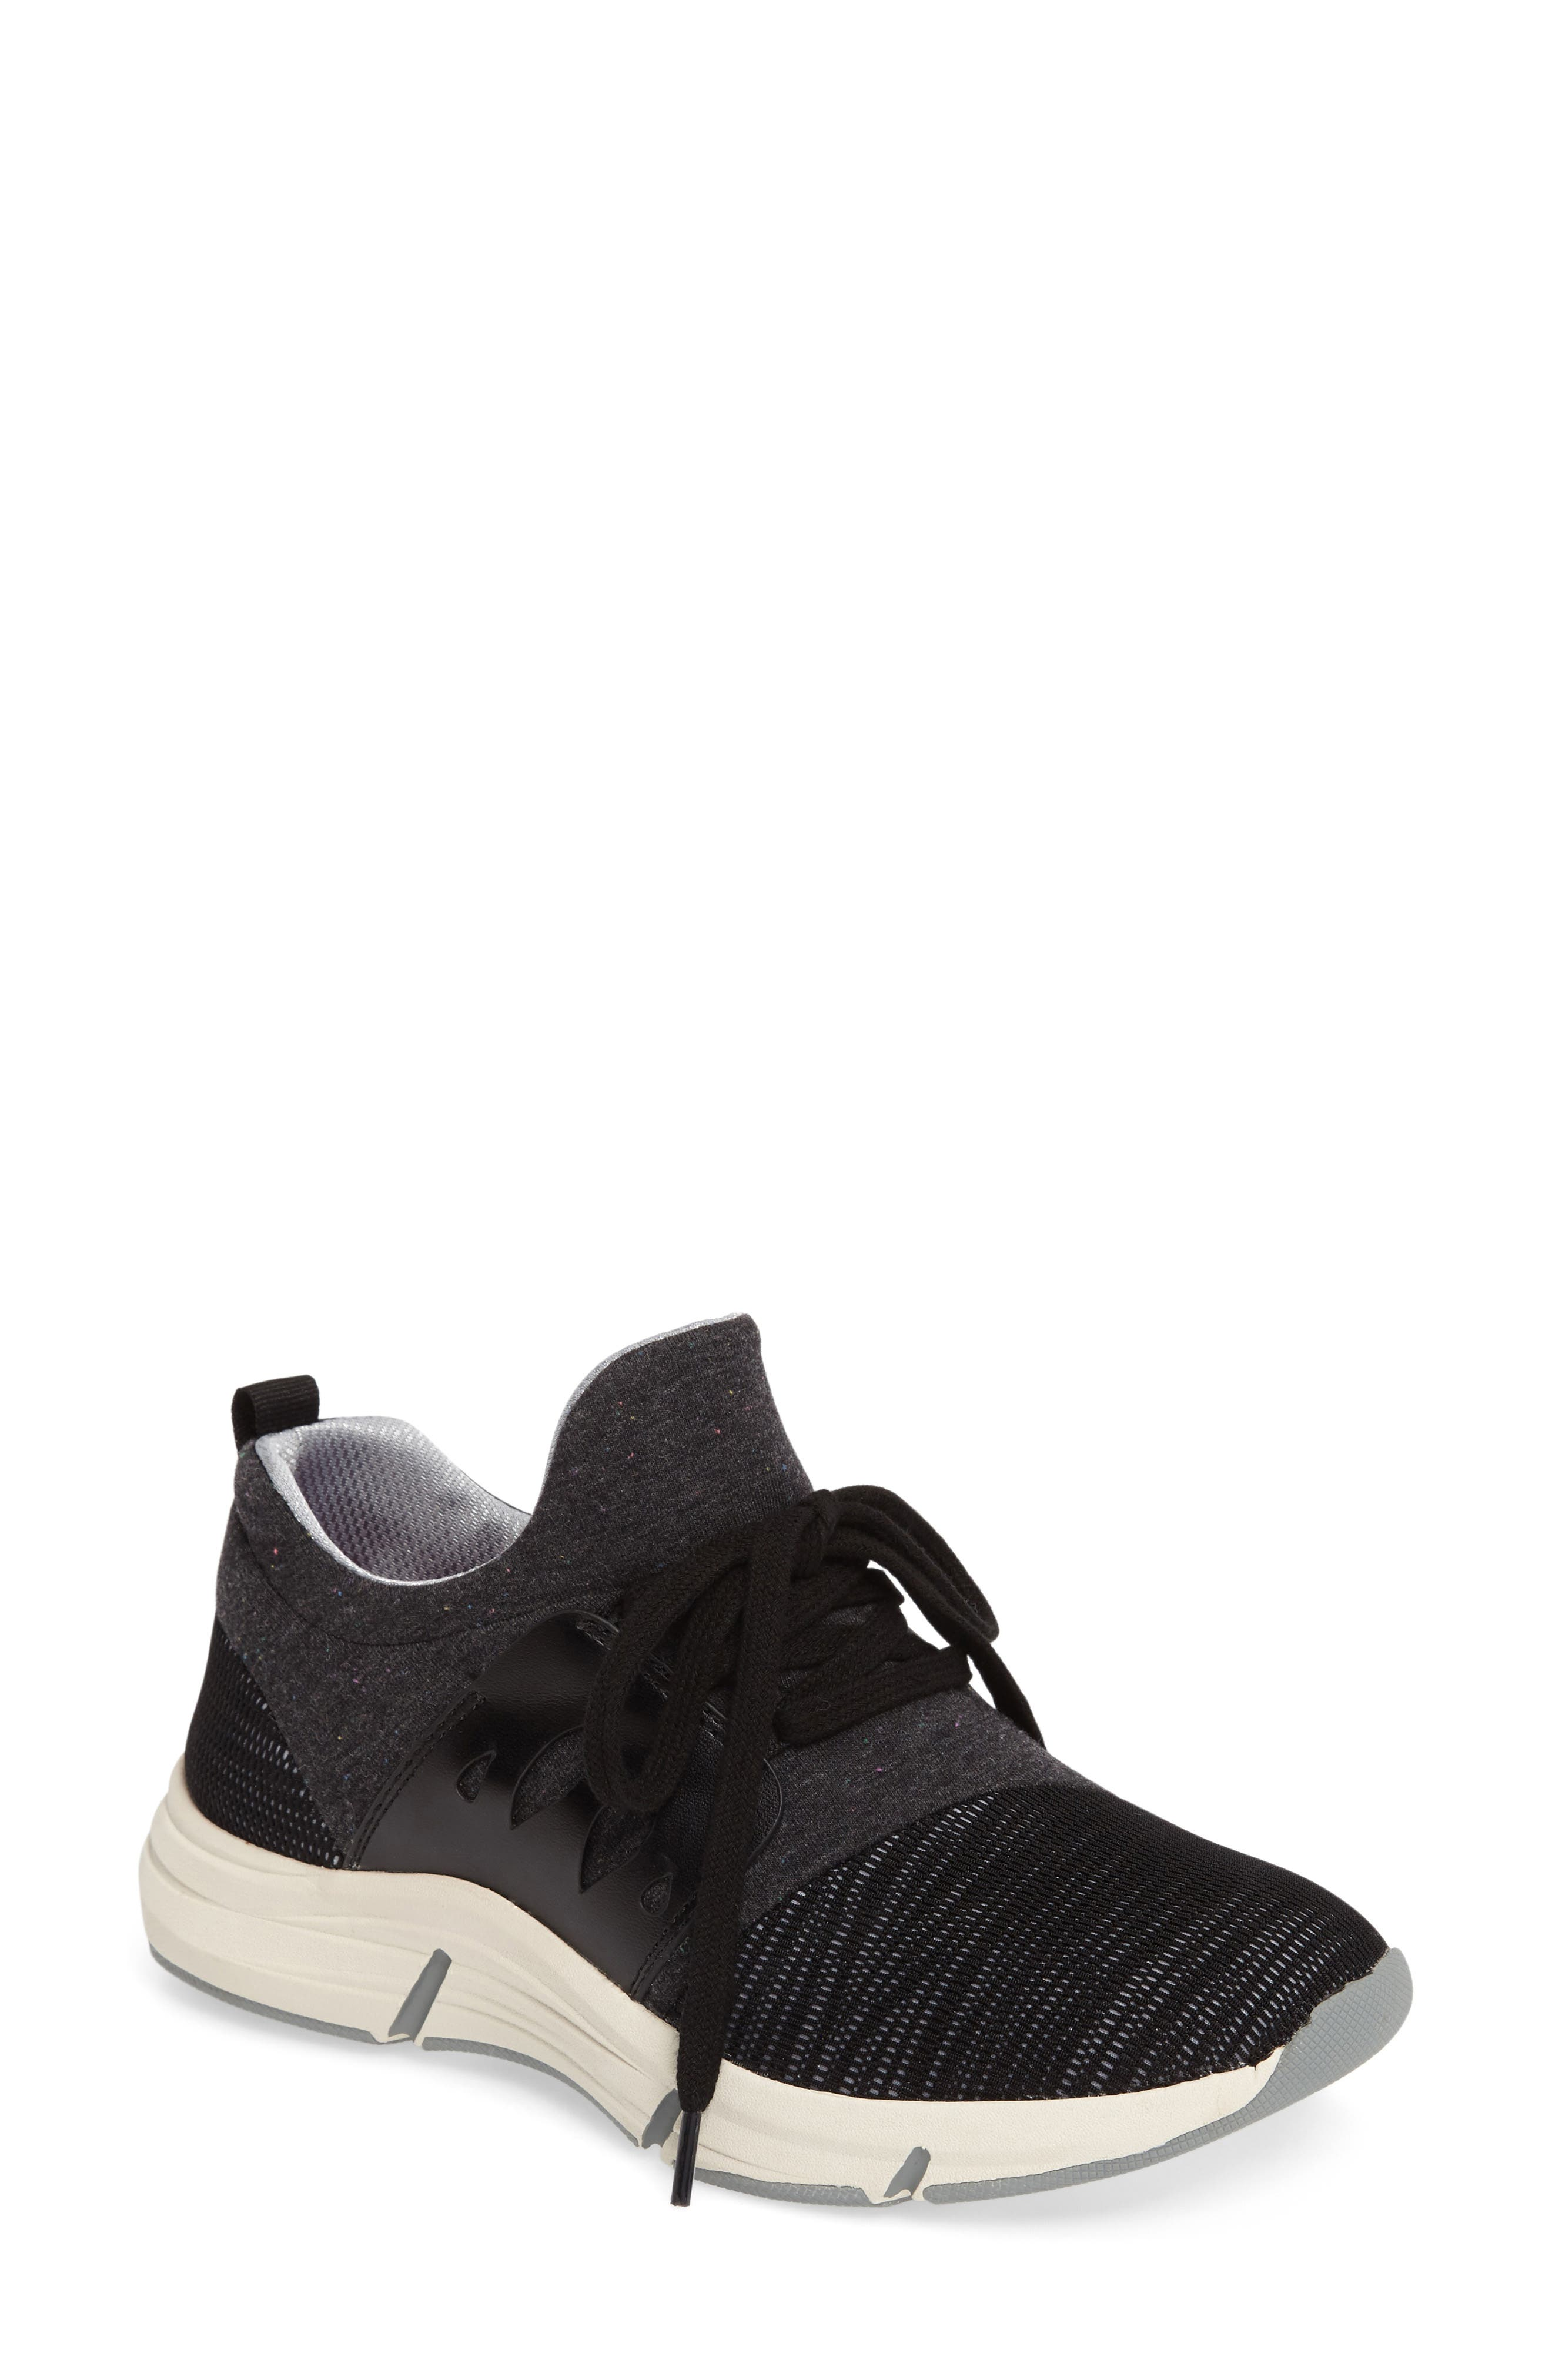 Bionica Ordell Sneaker- Black